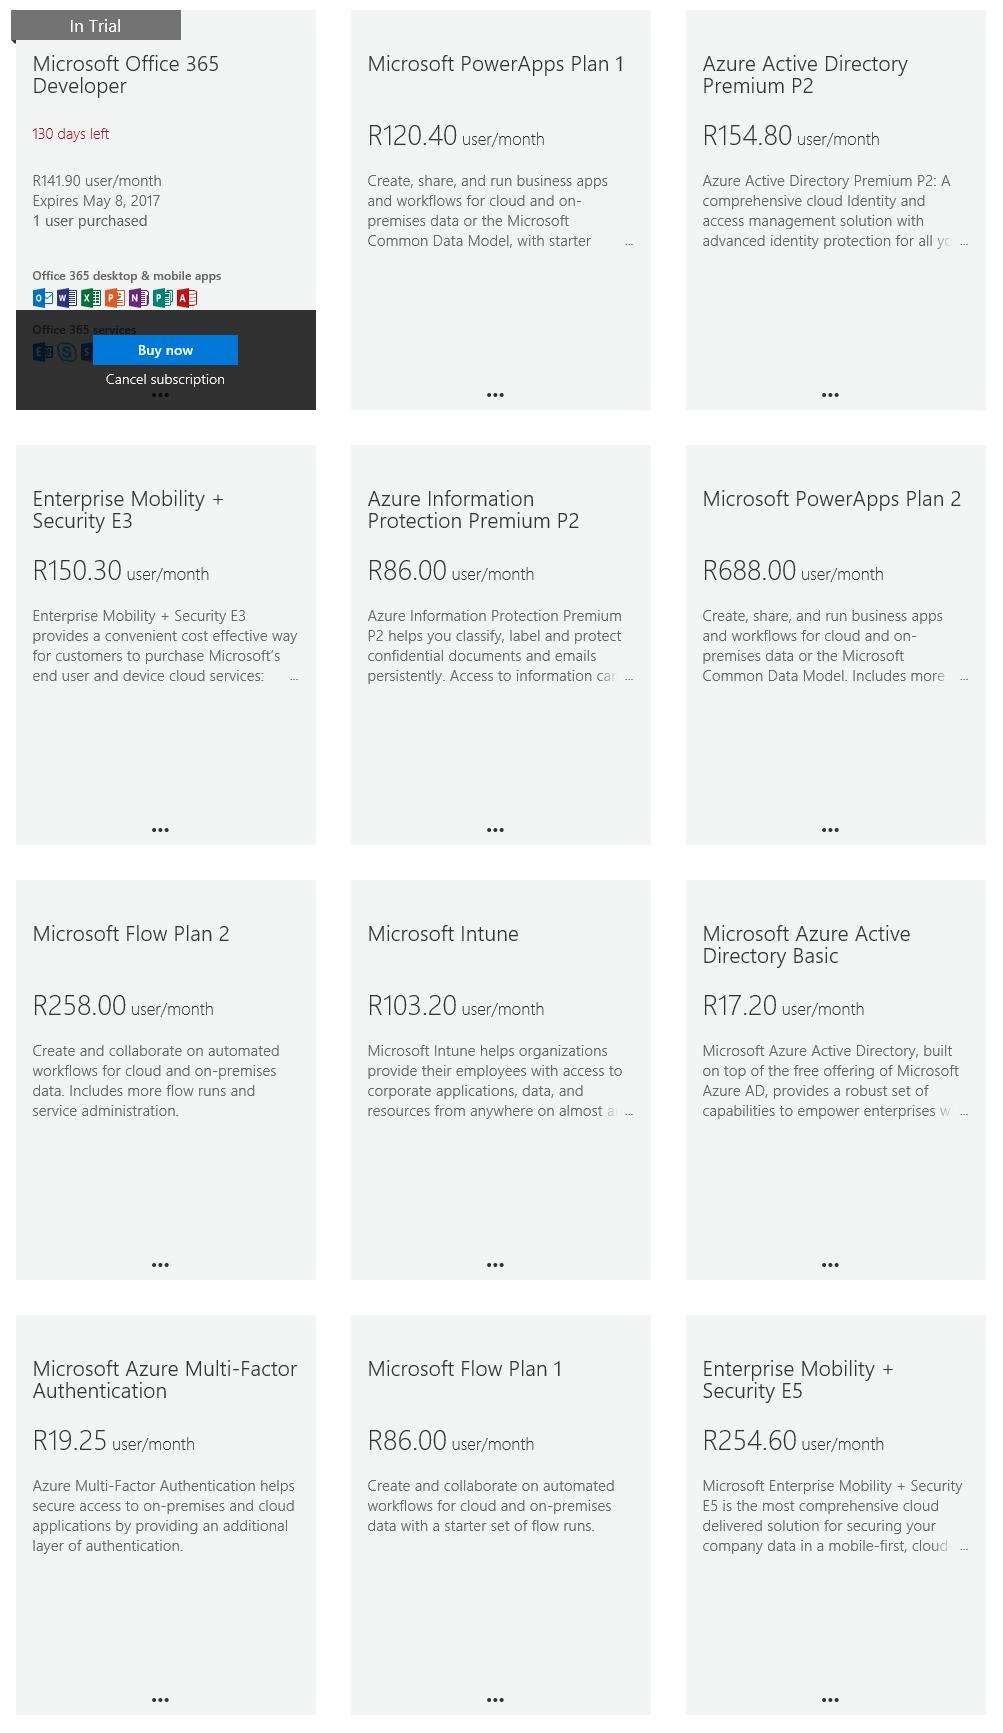 Microsoft Office 365 subscriptions list